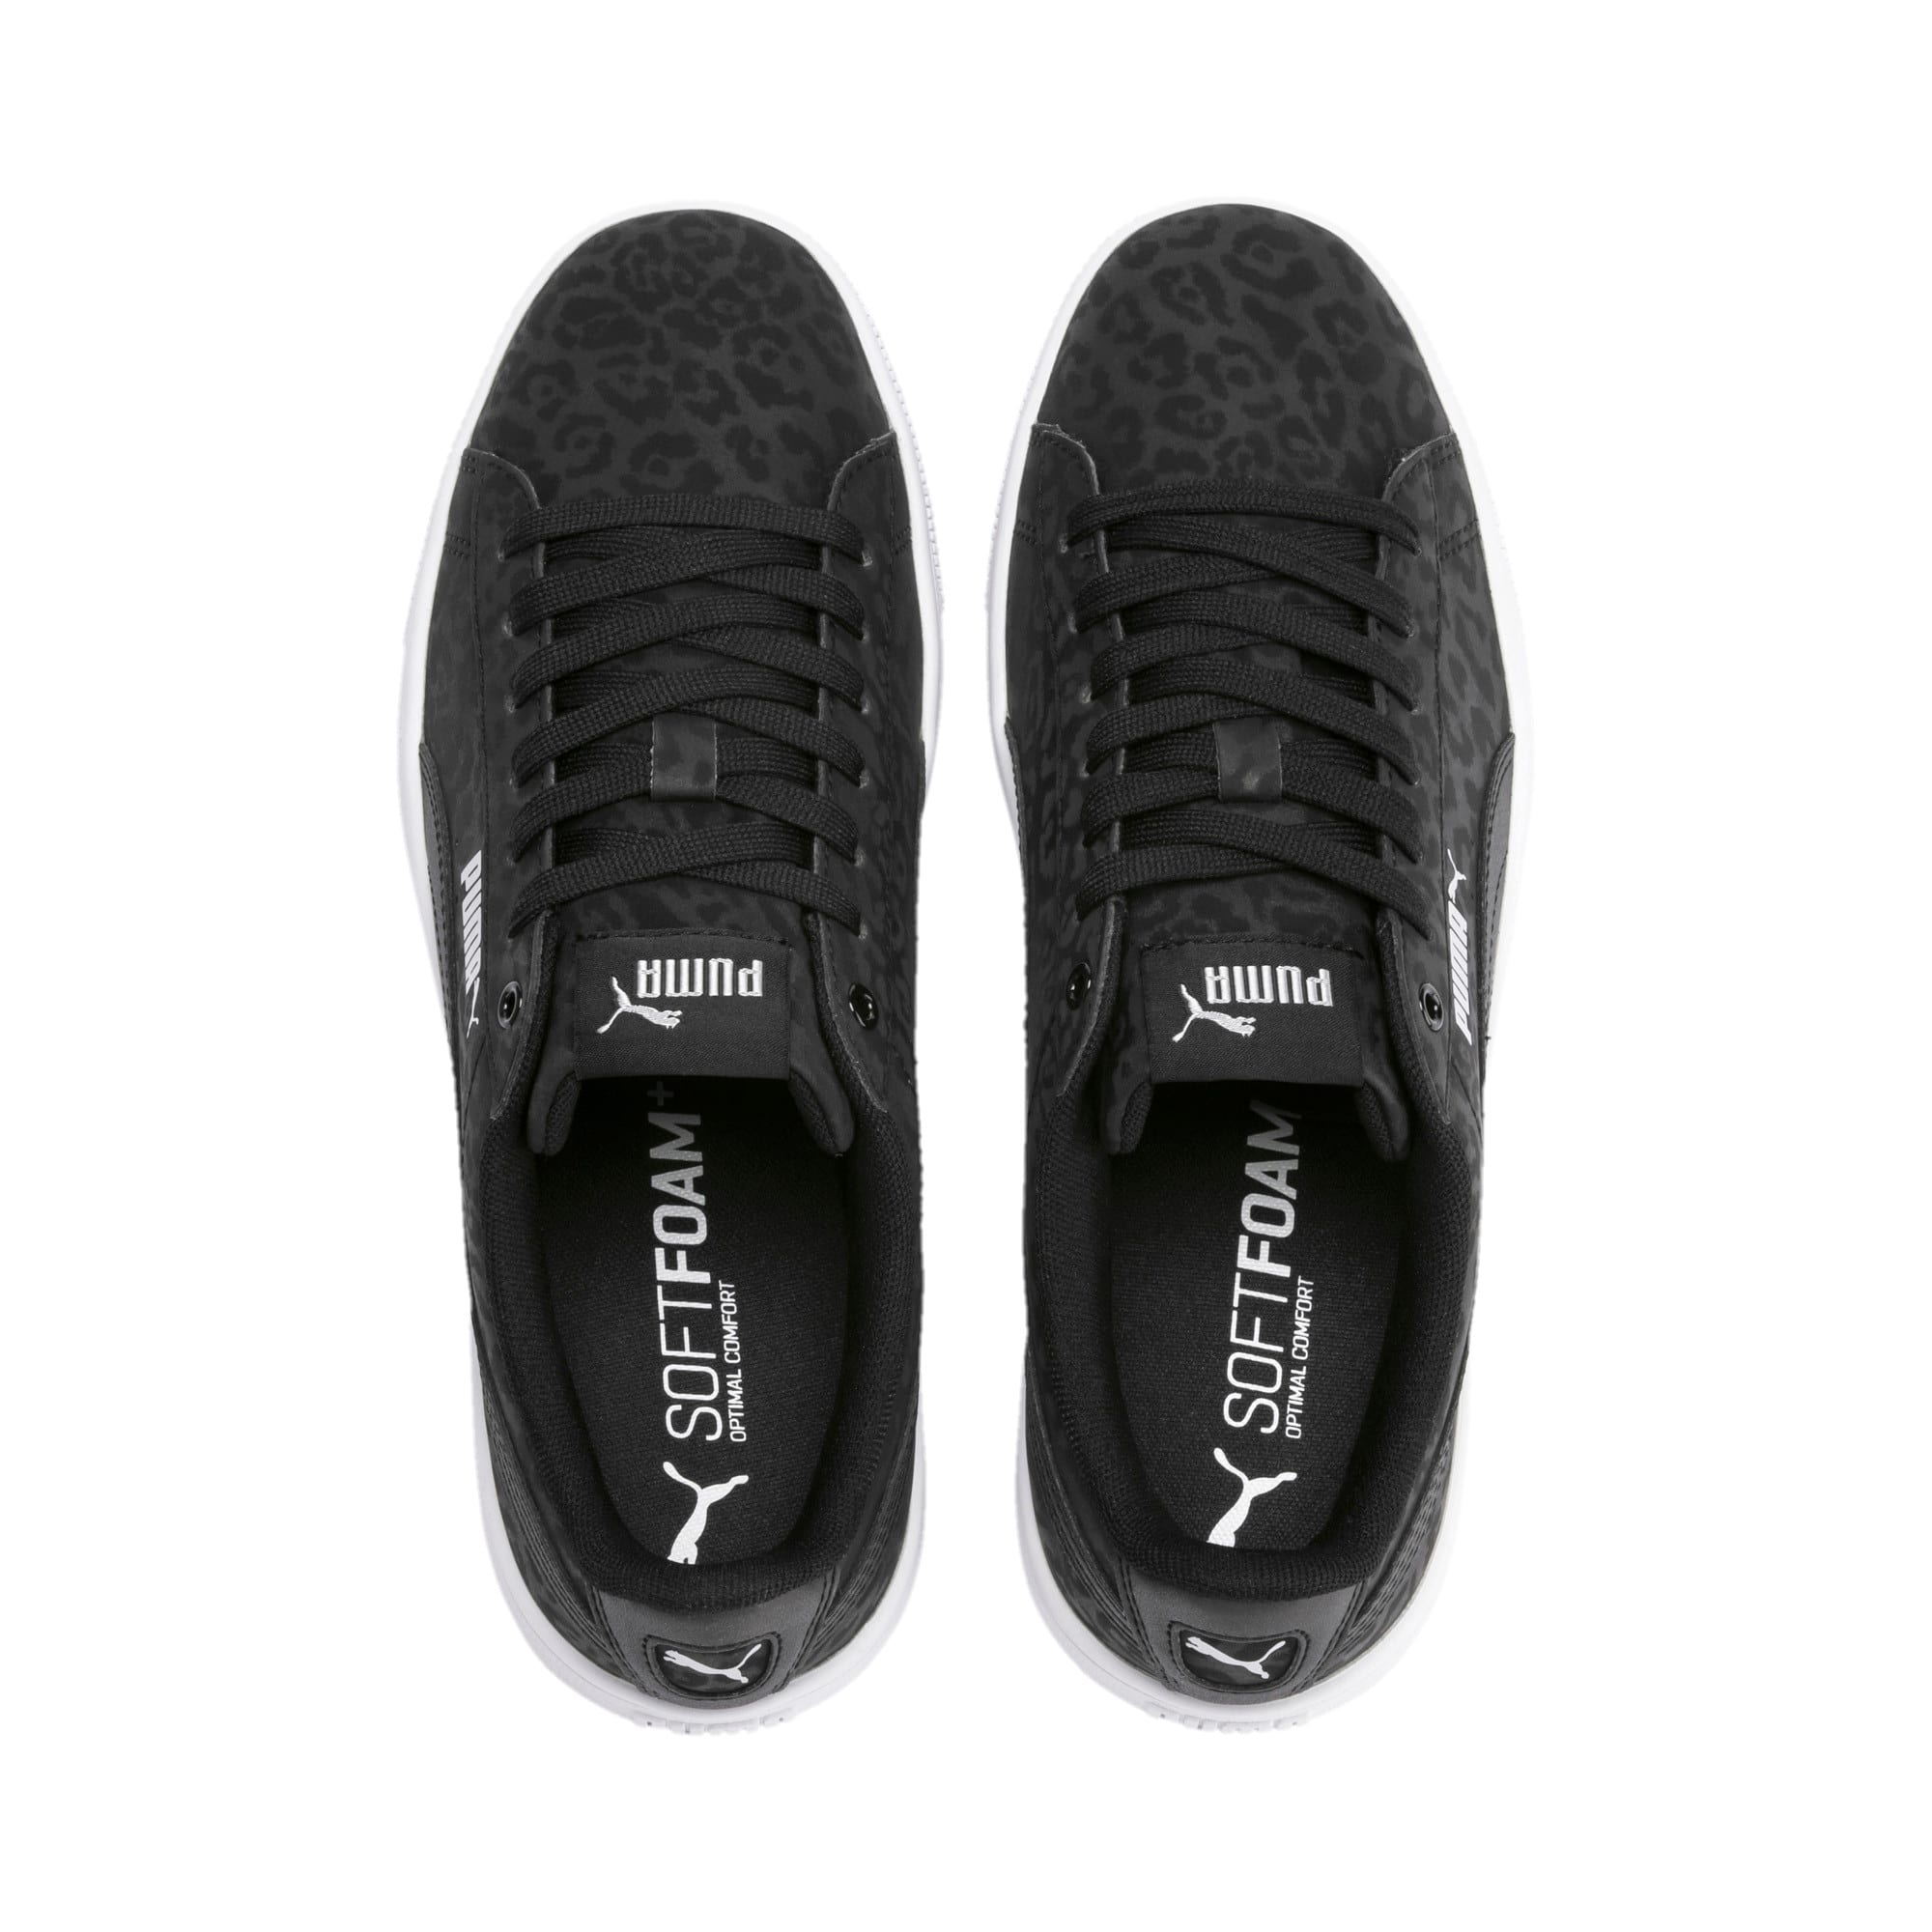 Thumbnail 7 of PUMA Vikky v2 Wildcat Women's Sneakers, Puma Black-Puma Silver-White, medium